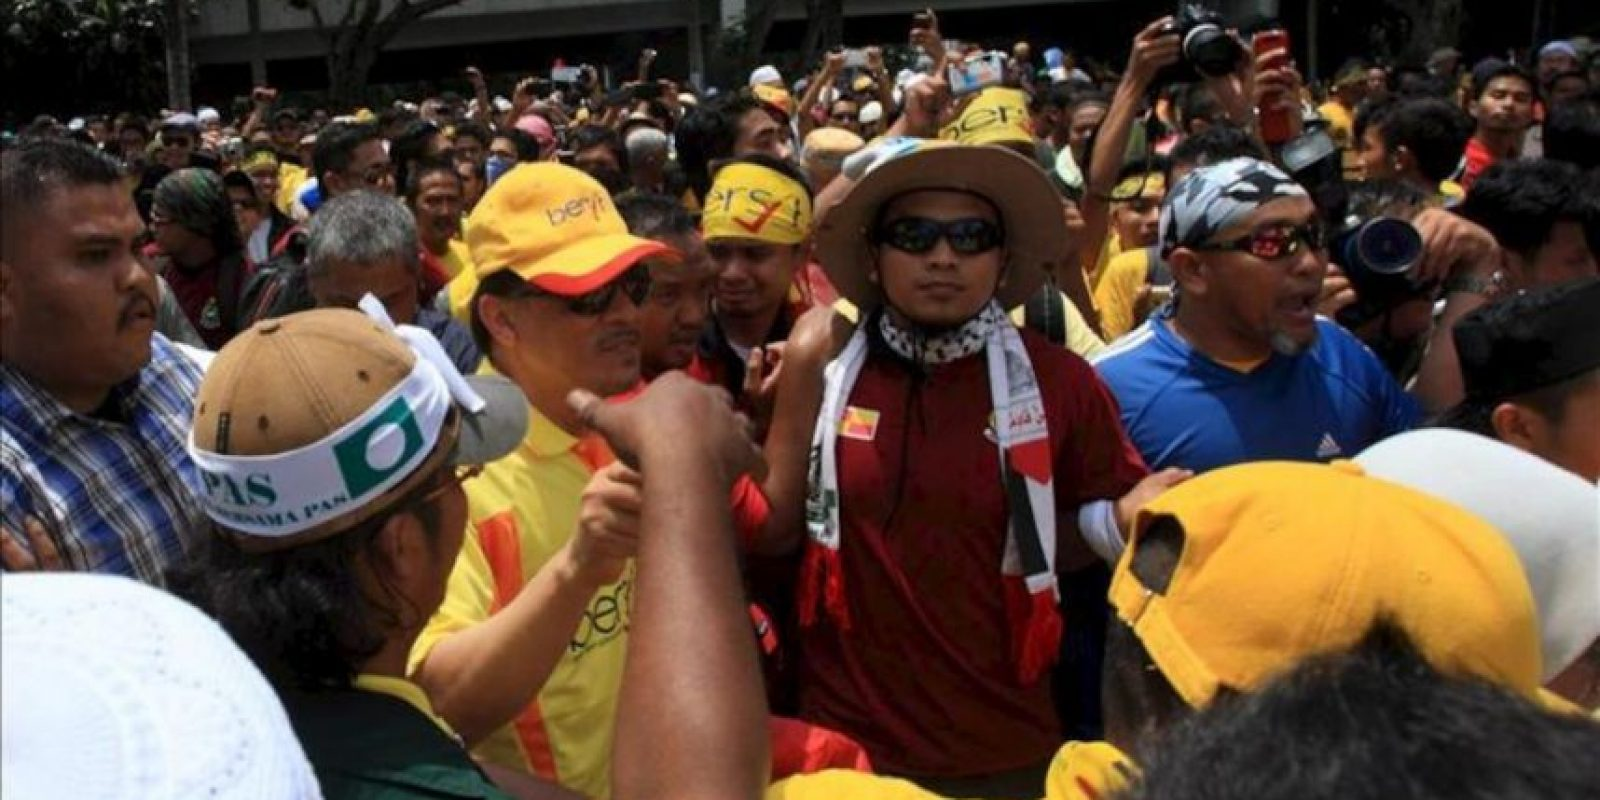 El líder opositor Anwar Ibrahim (i, gorra amarilla) llega a la Mezquita Nacional durante la marcha Bersih (limpieza) en el centro de Kuala Lumpur, Malasia. EFE